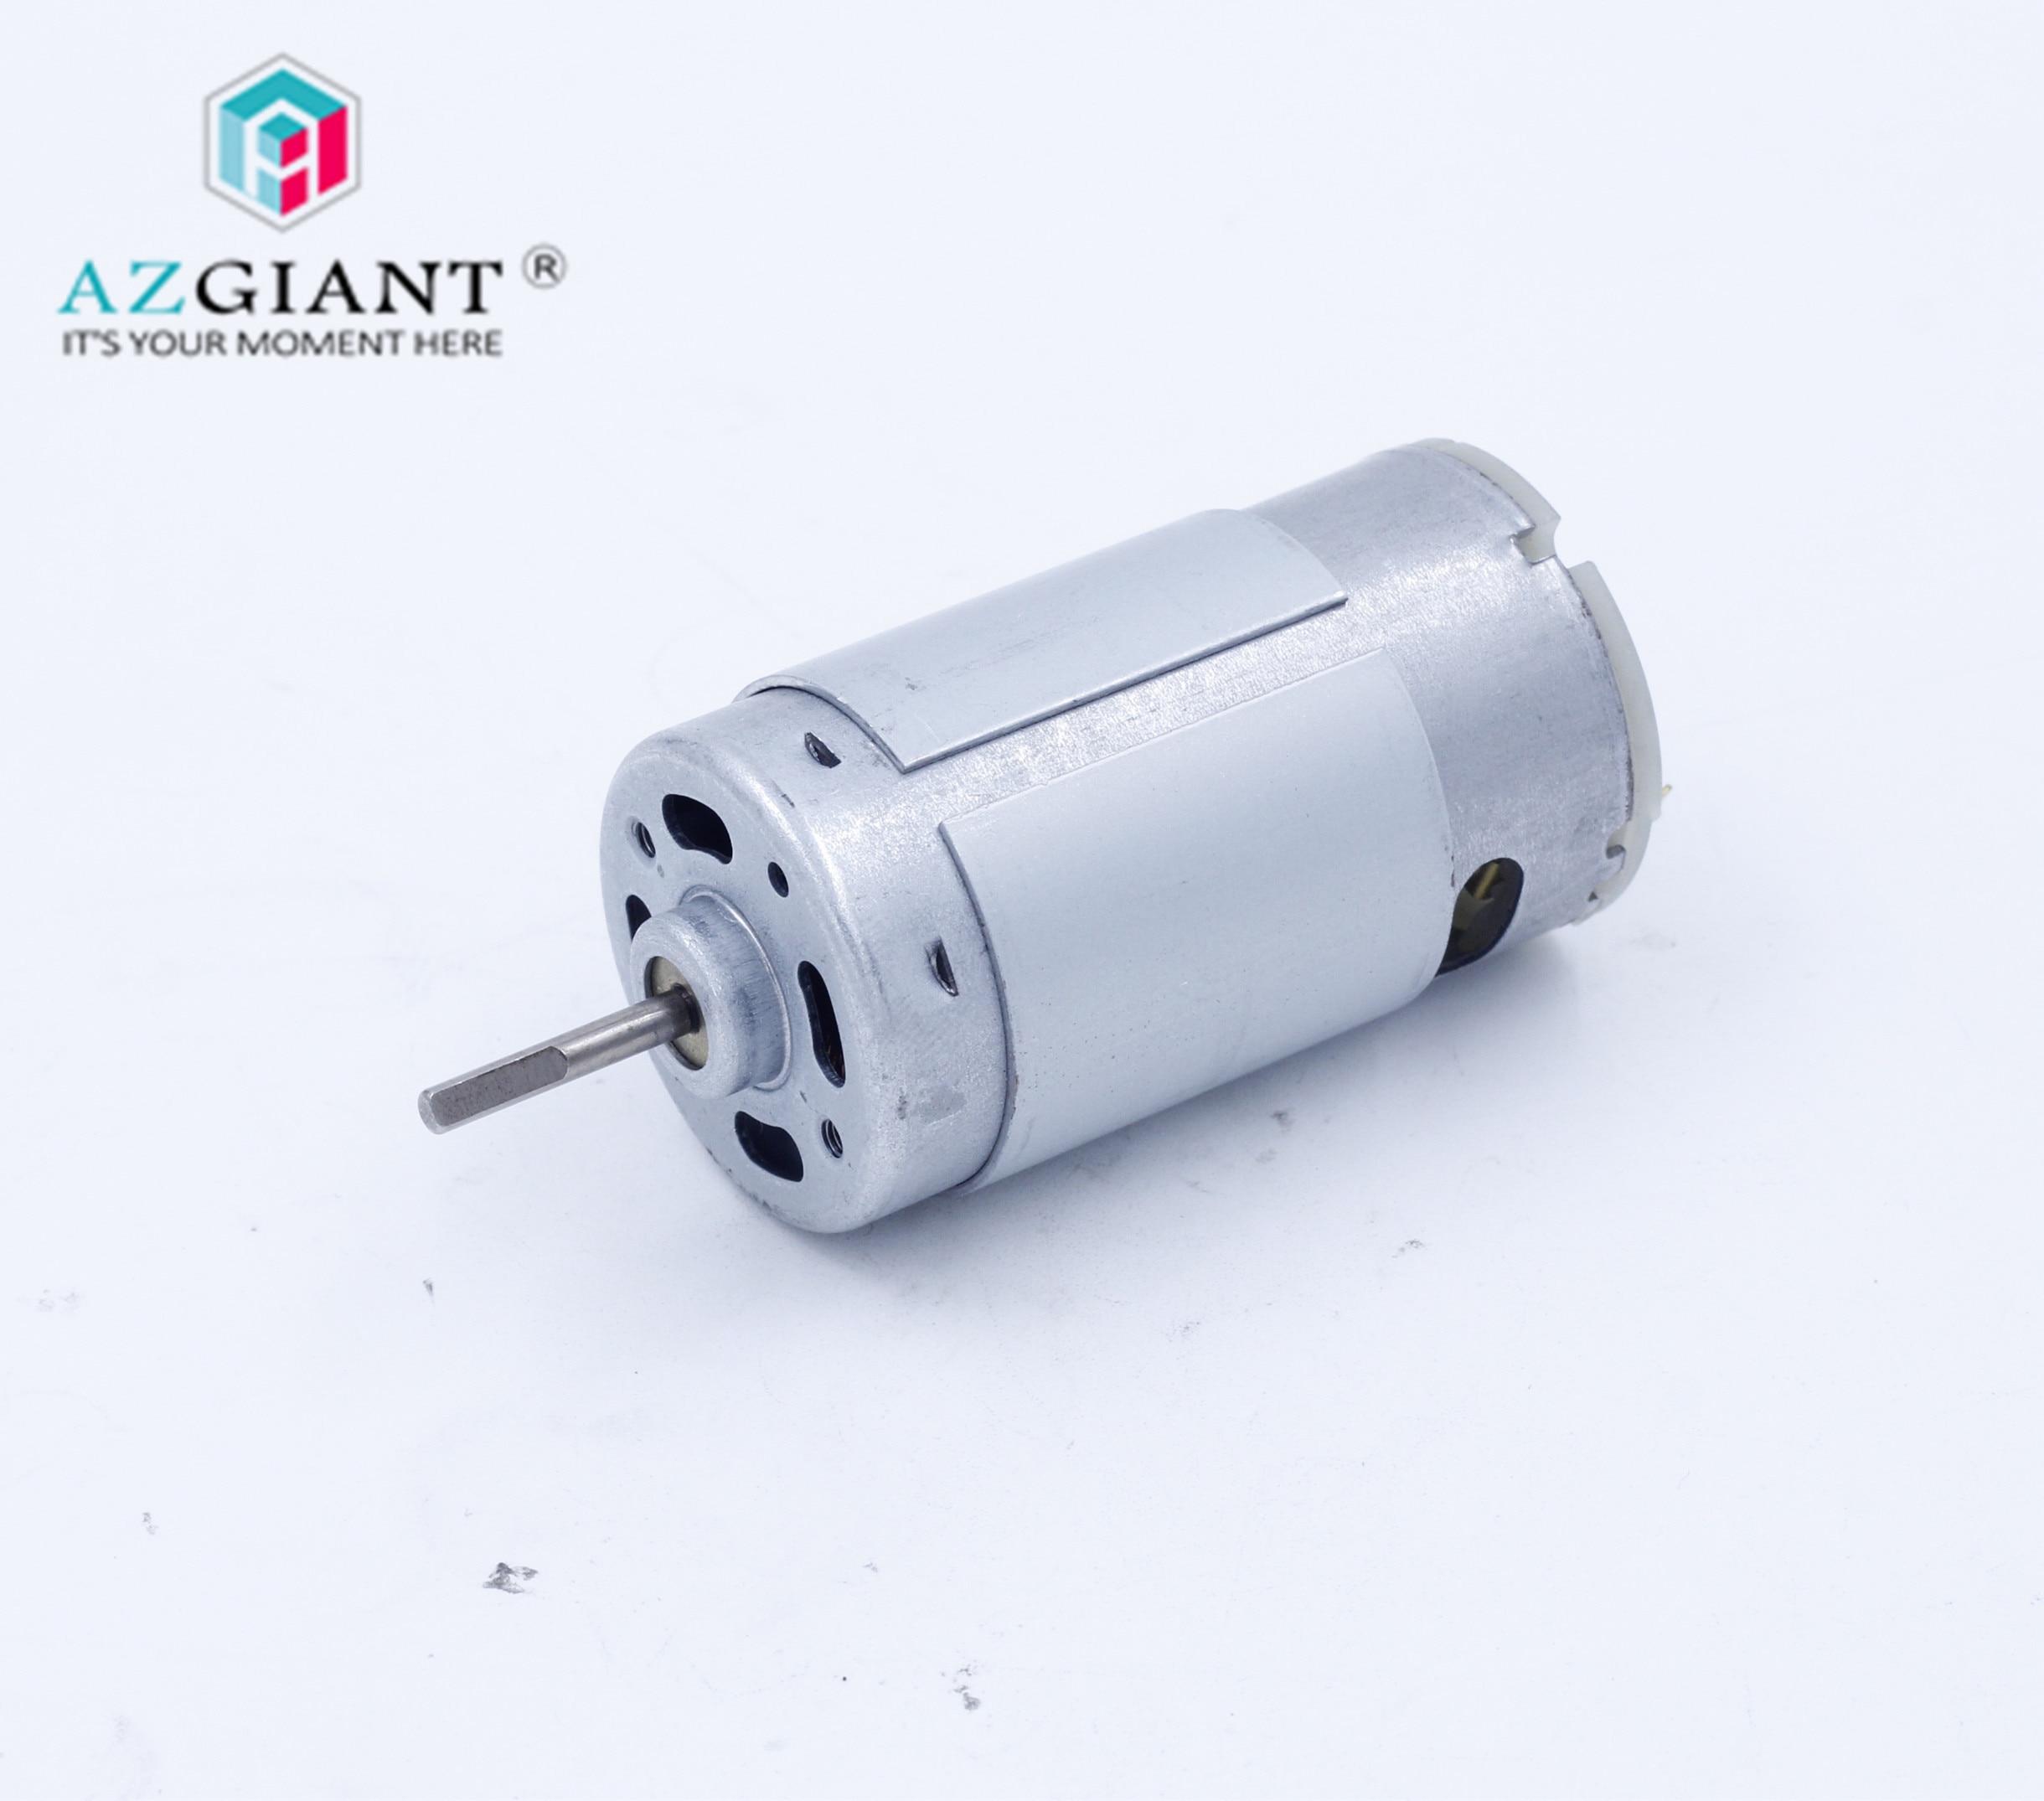 New Vacuum Supply Pump Motor For Mercedes-Benz S350 S430 2208001248